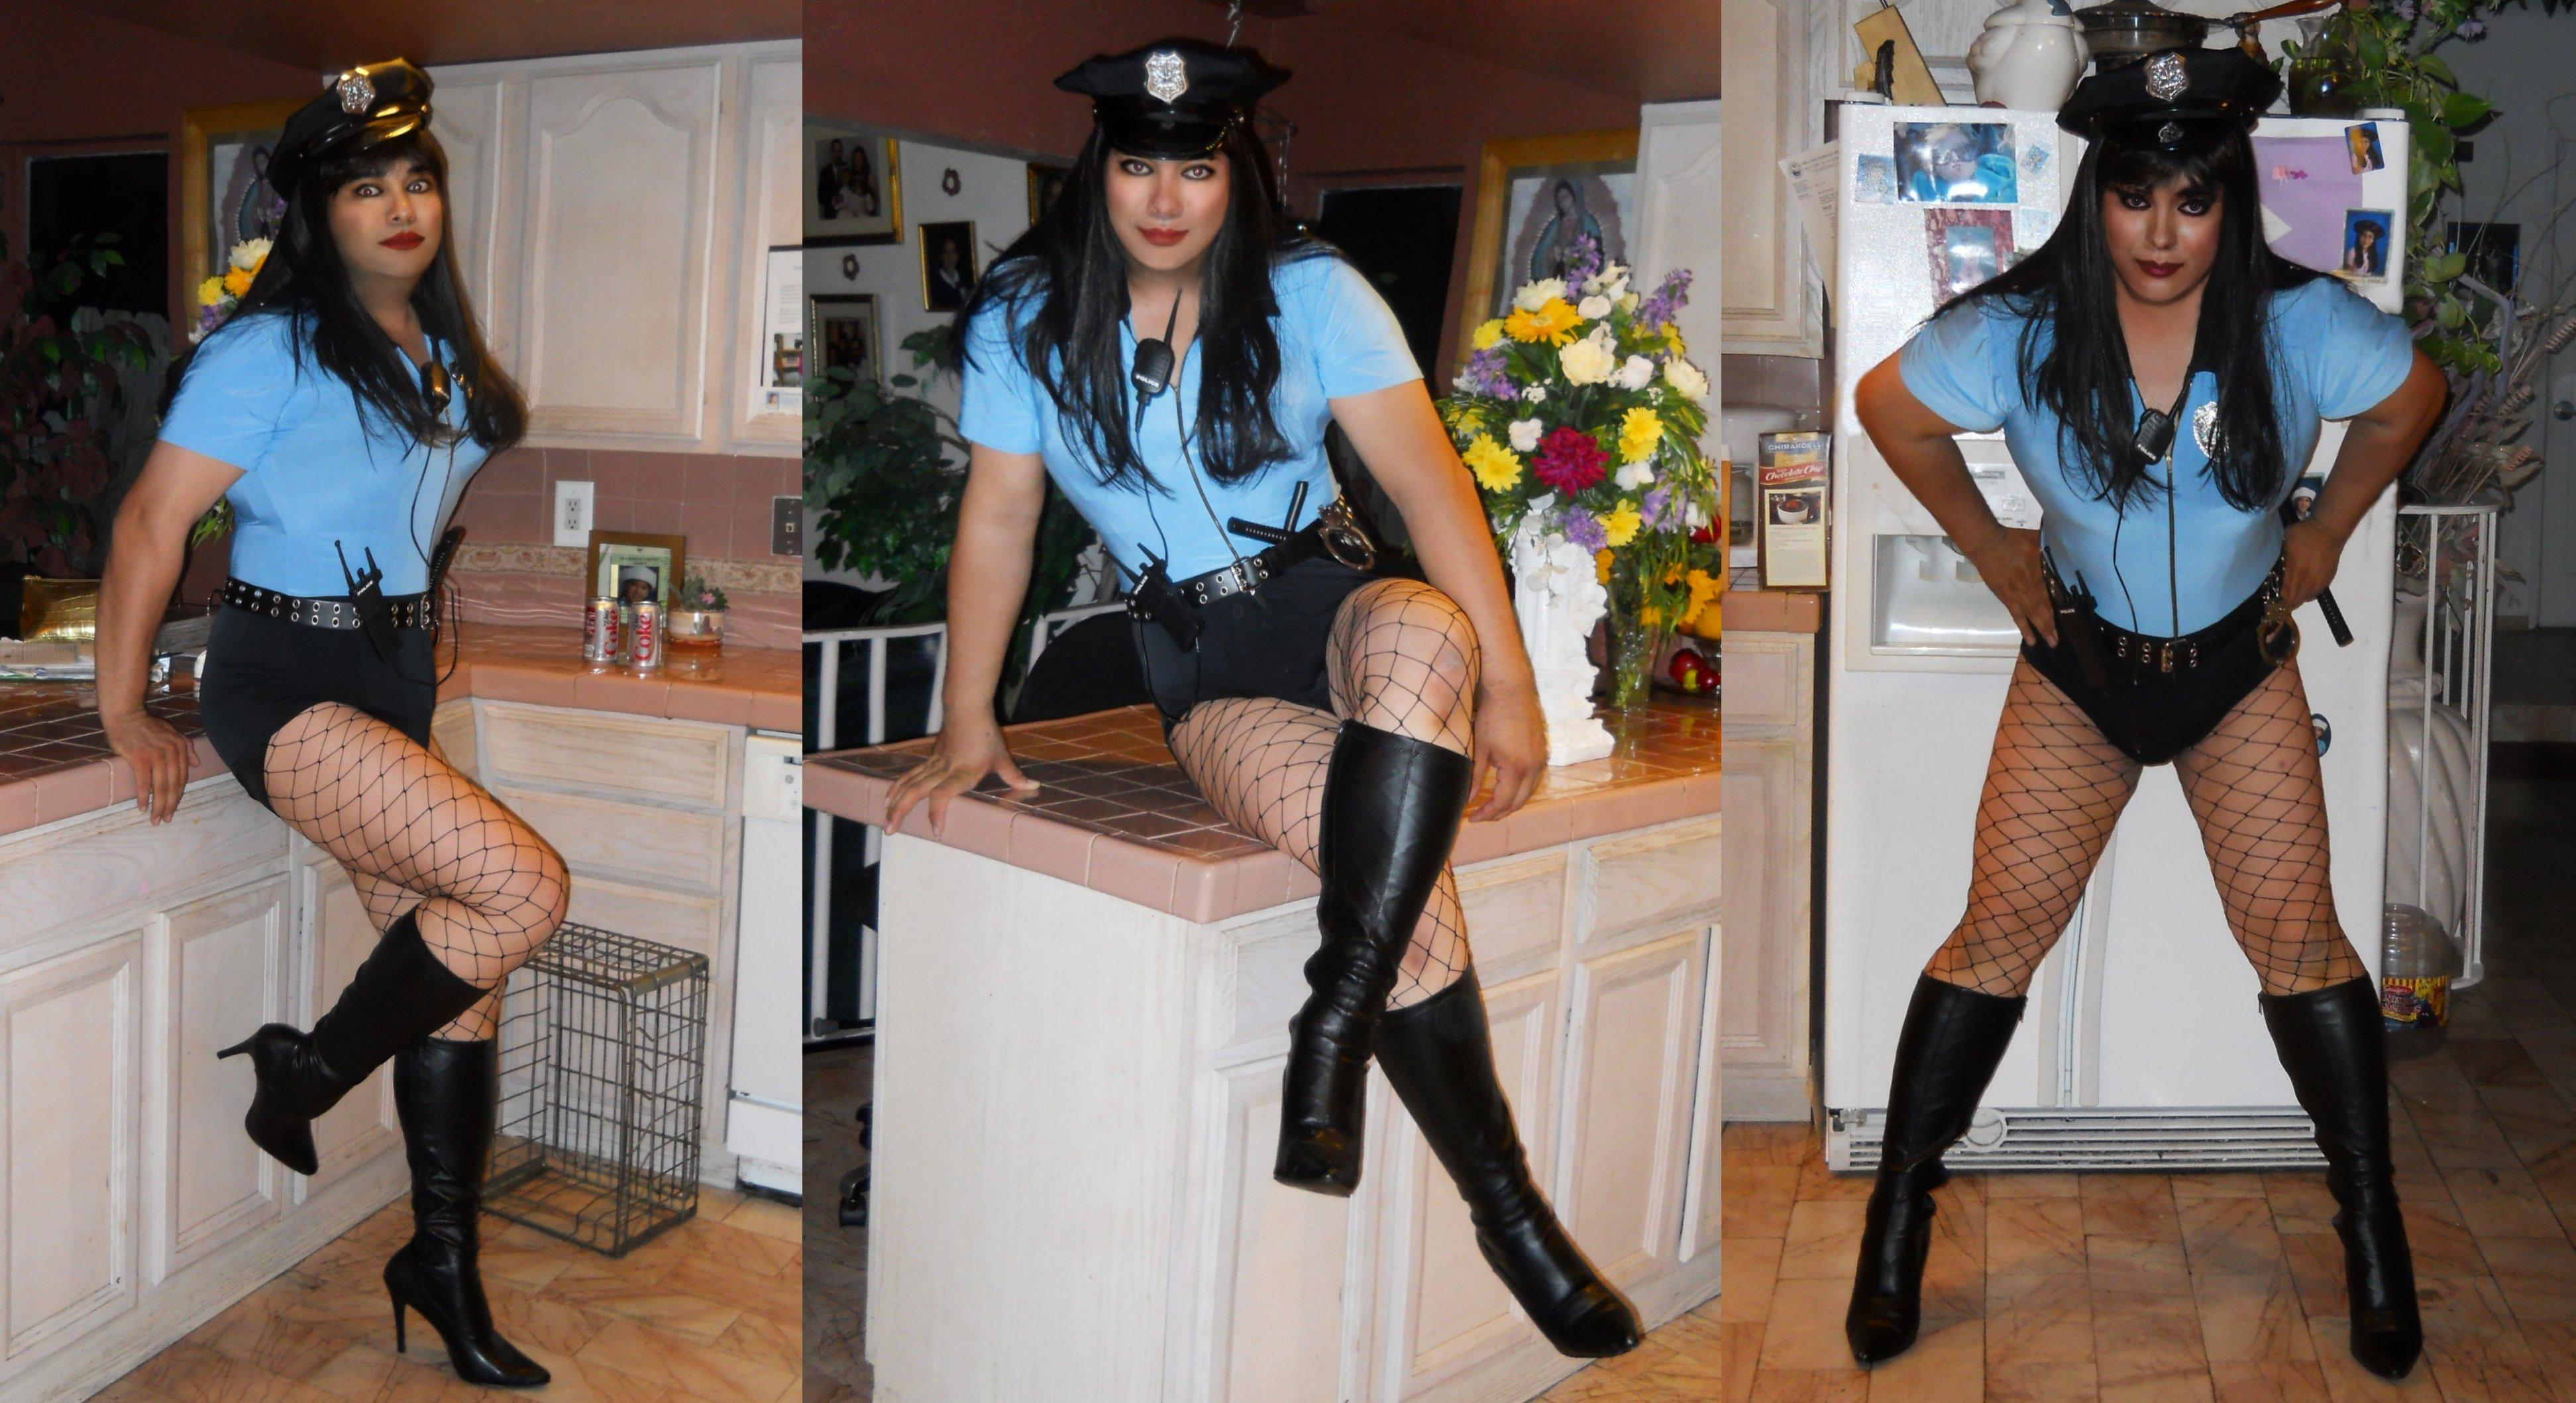 halloween dress up Transvestite crossdresser